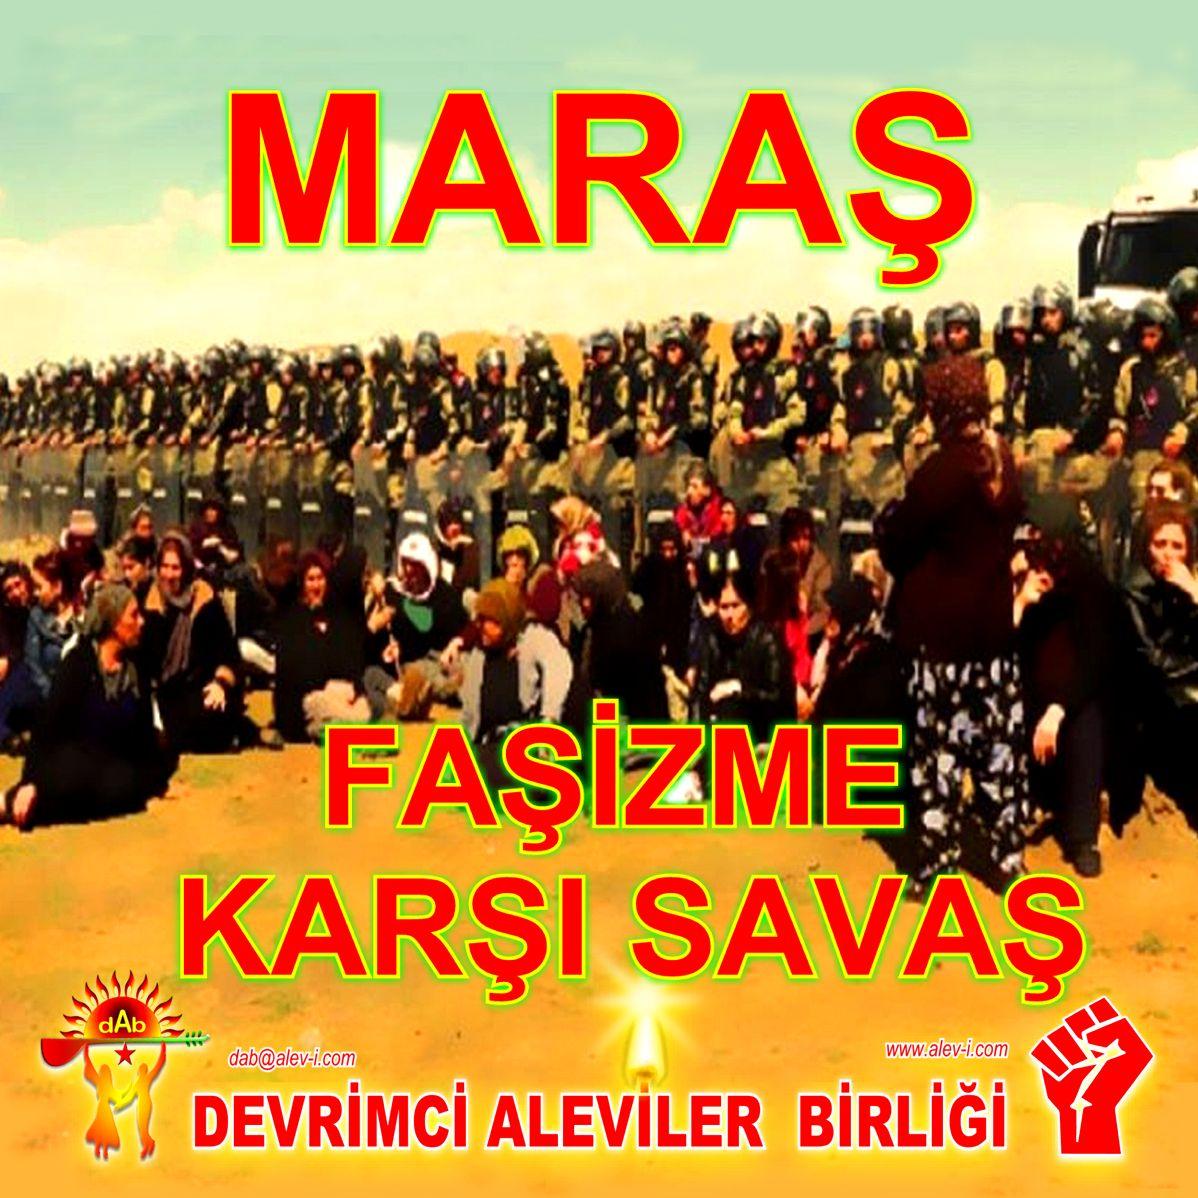 Devrimci Aleviler Birliği DAB Alevi Kızılbaş Bektaşi pir sultan cem hz Ali 12 imam semah Feramuz Şah Acar maras fasizme karsi savas